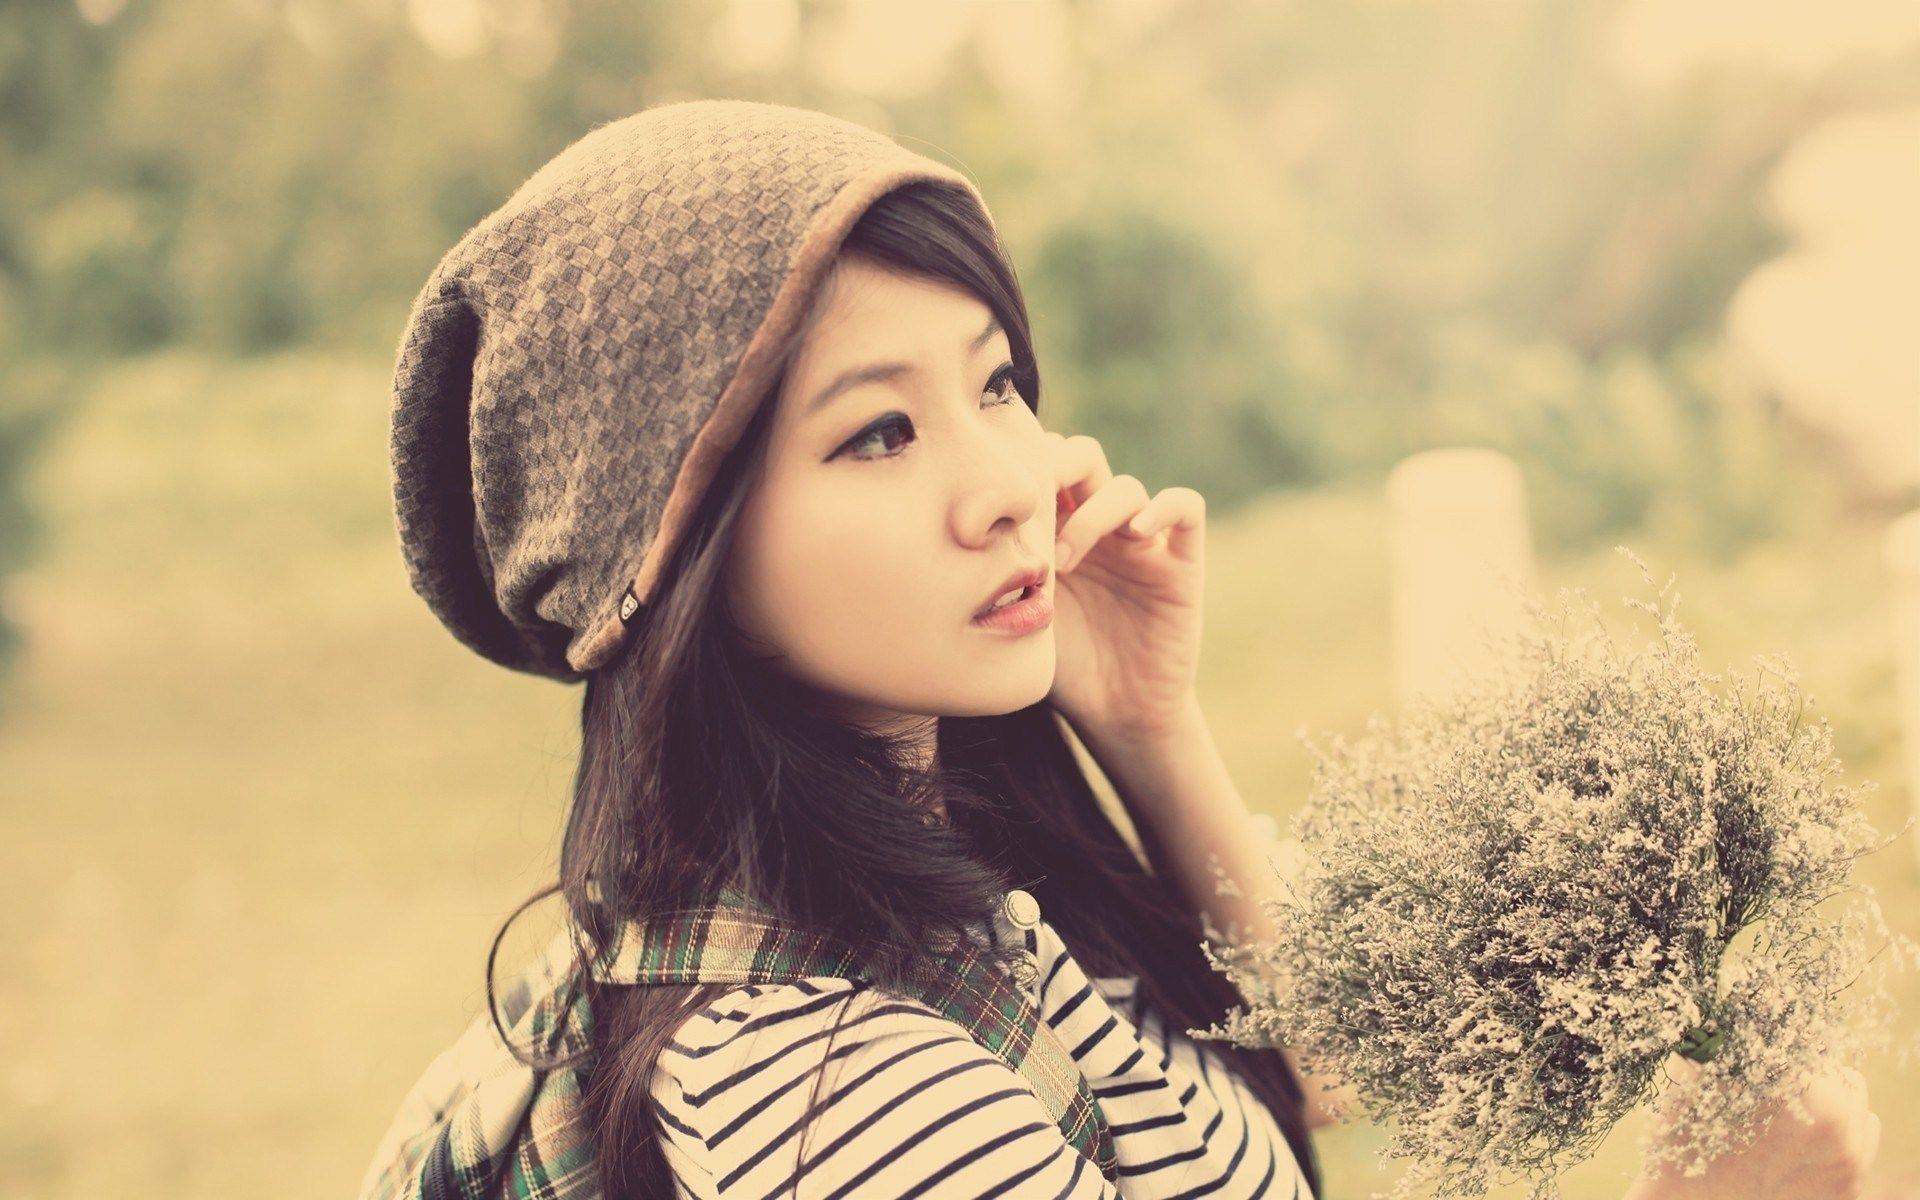 pretty asian girl wallpaper - sf wallpaper